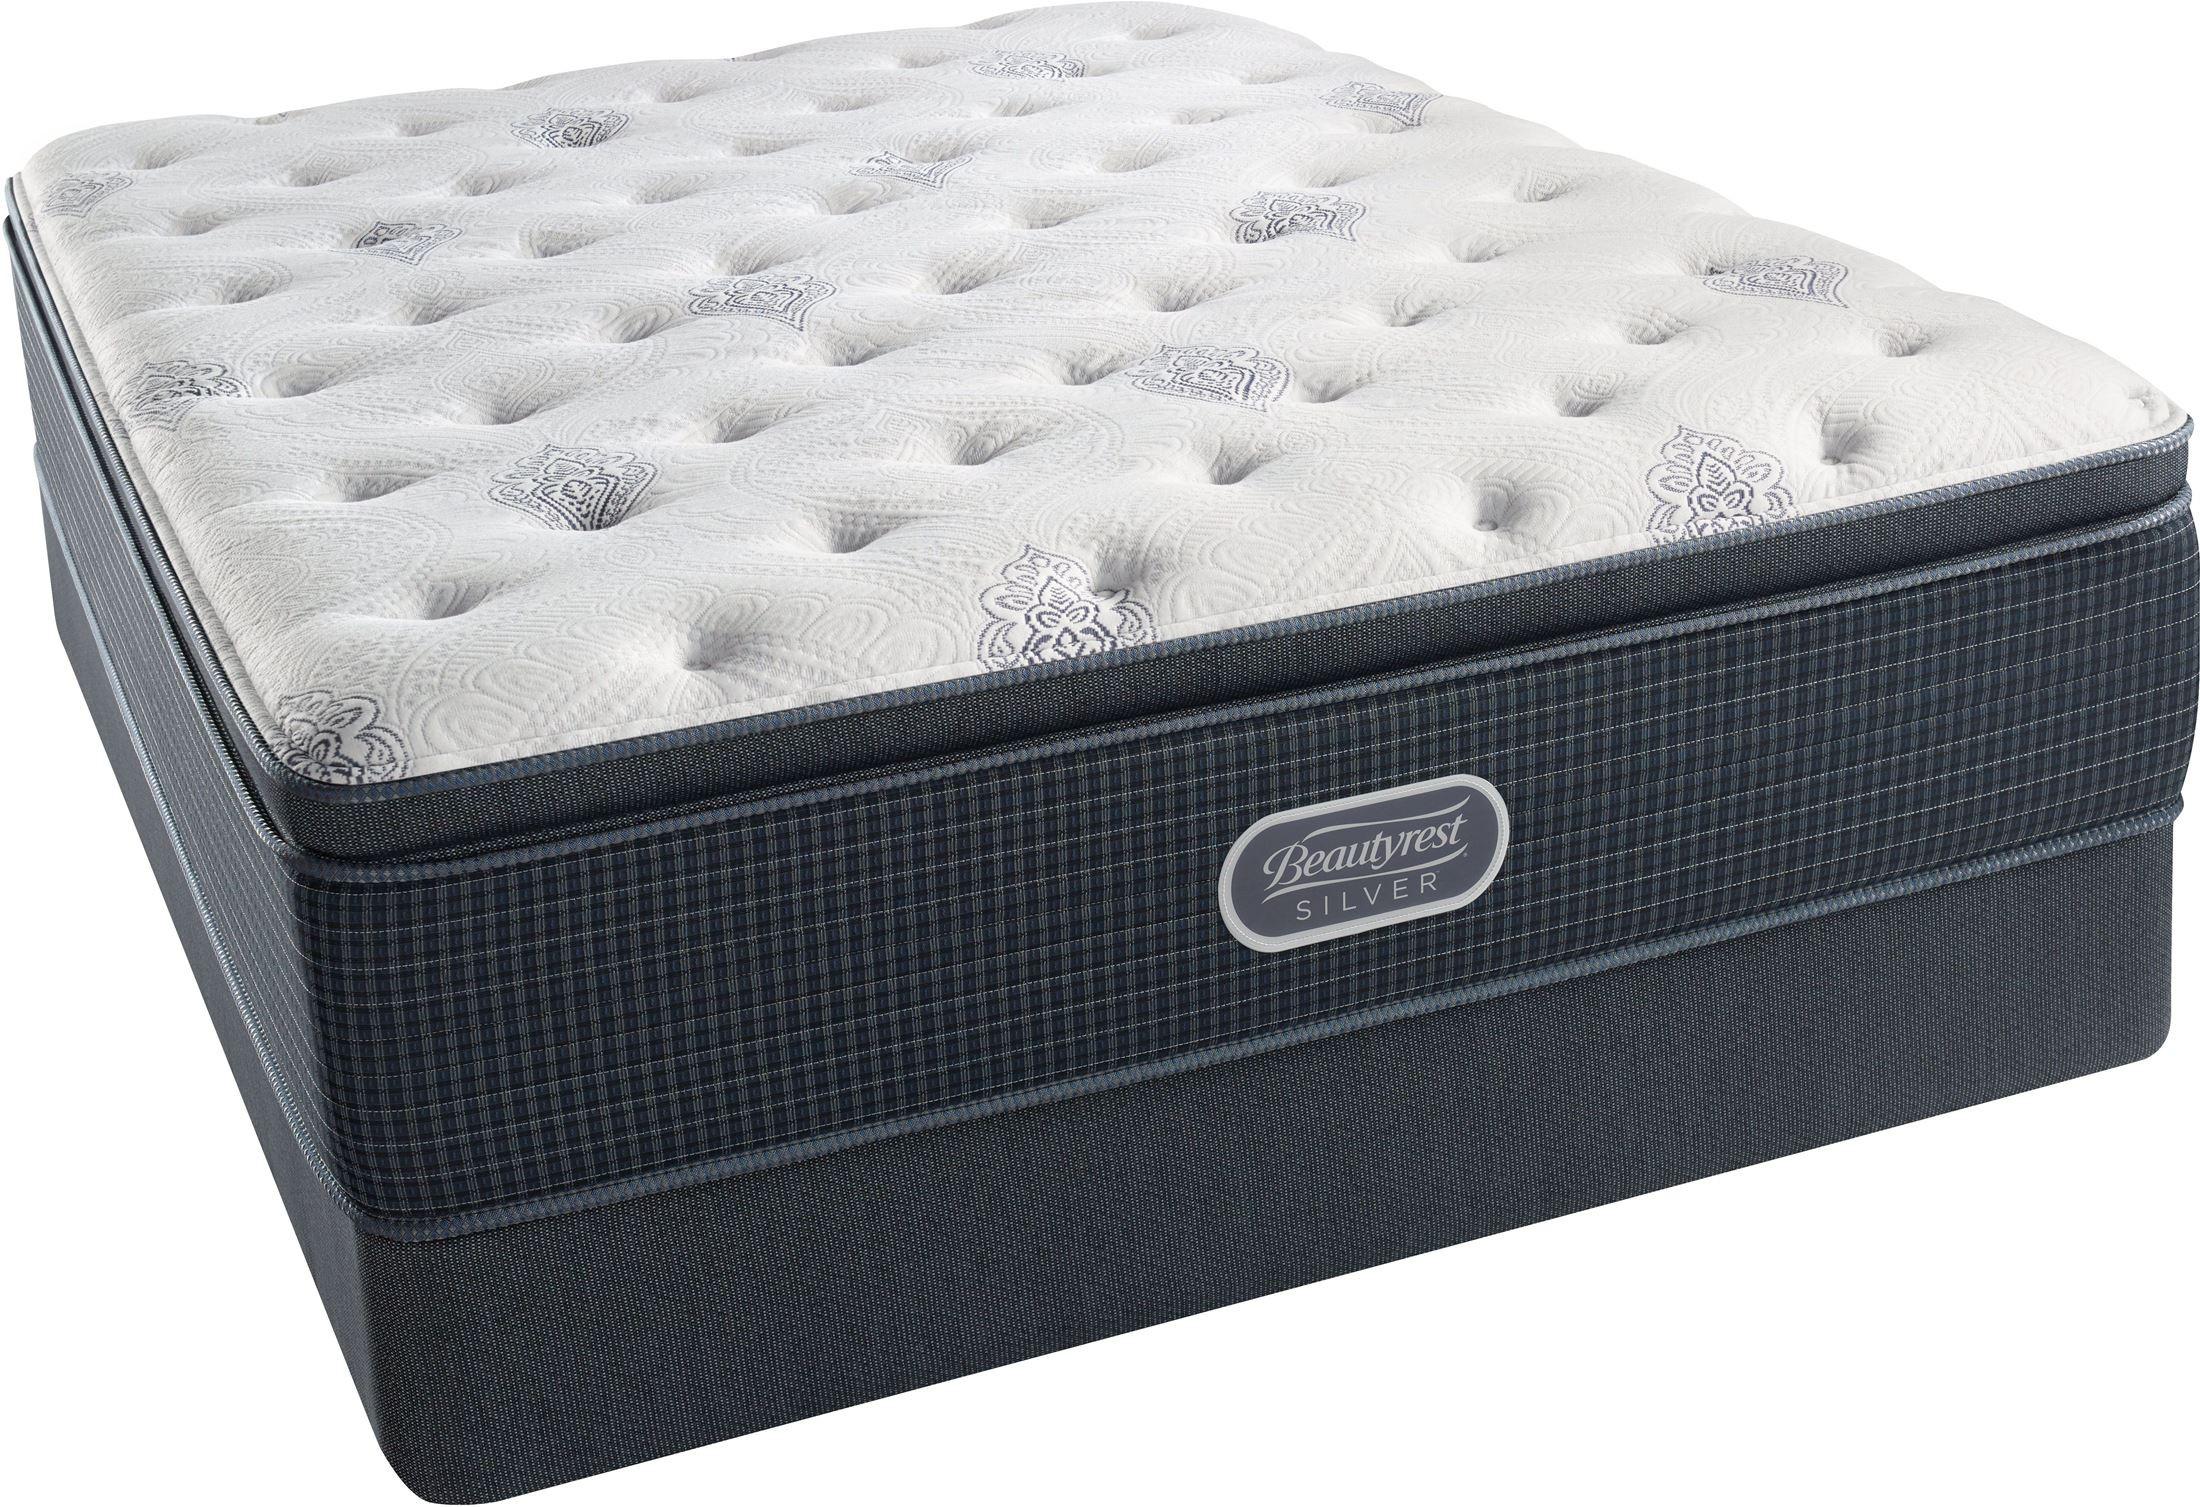 Beautyrest Recharge Silver Offshore Mist Pillow Top Luxury